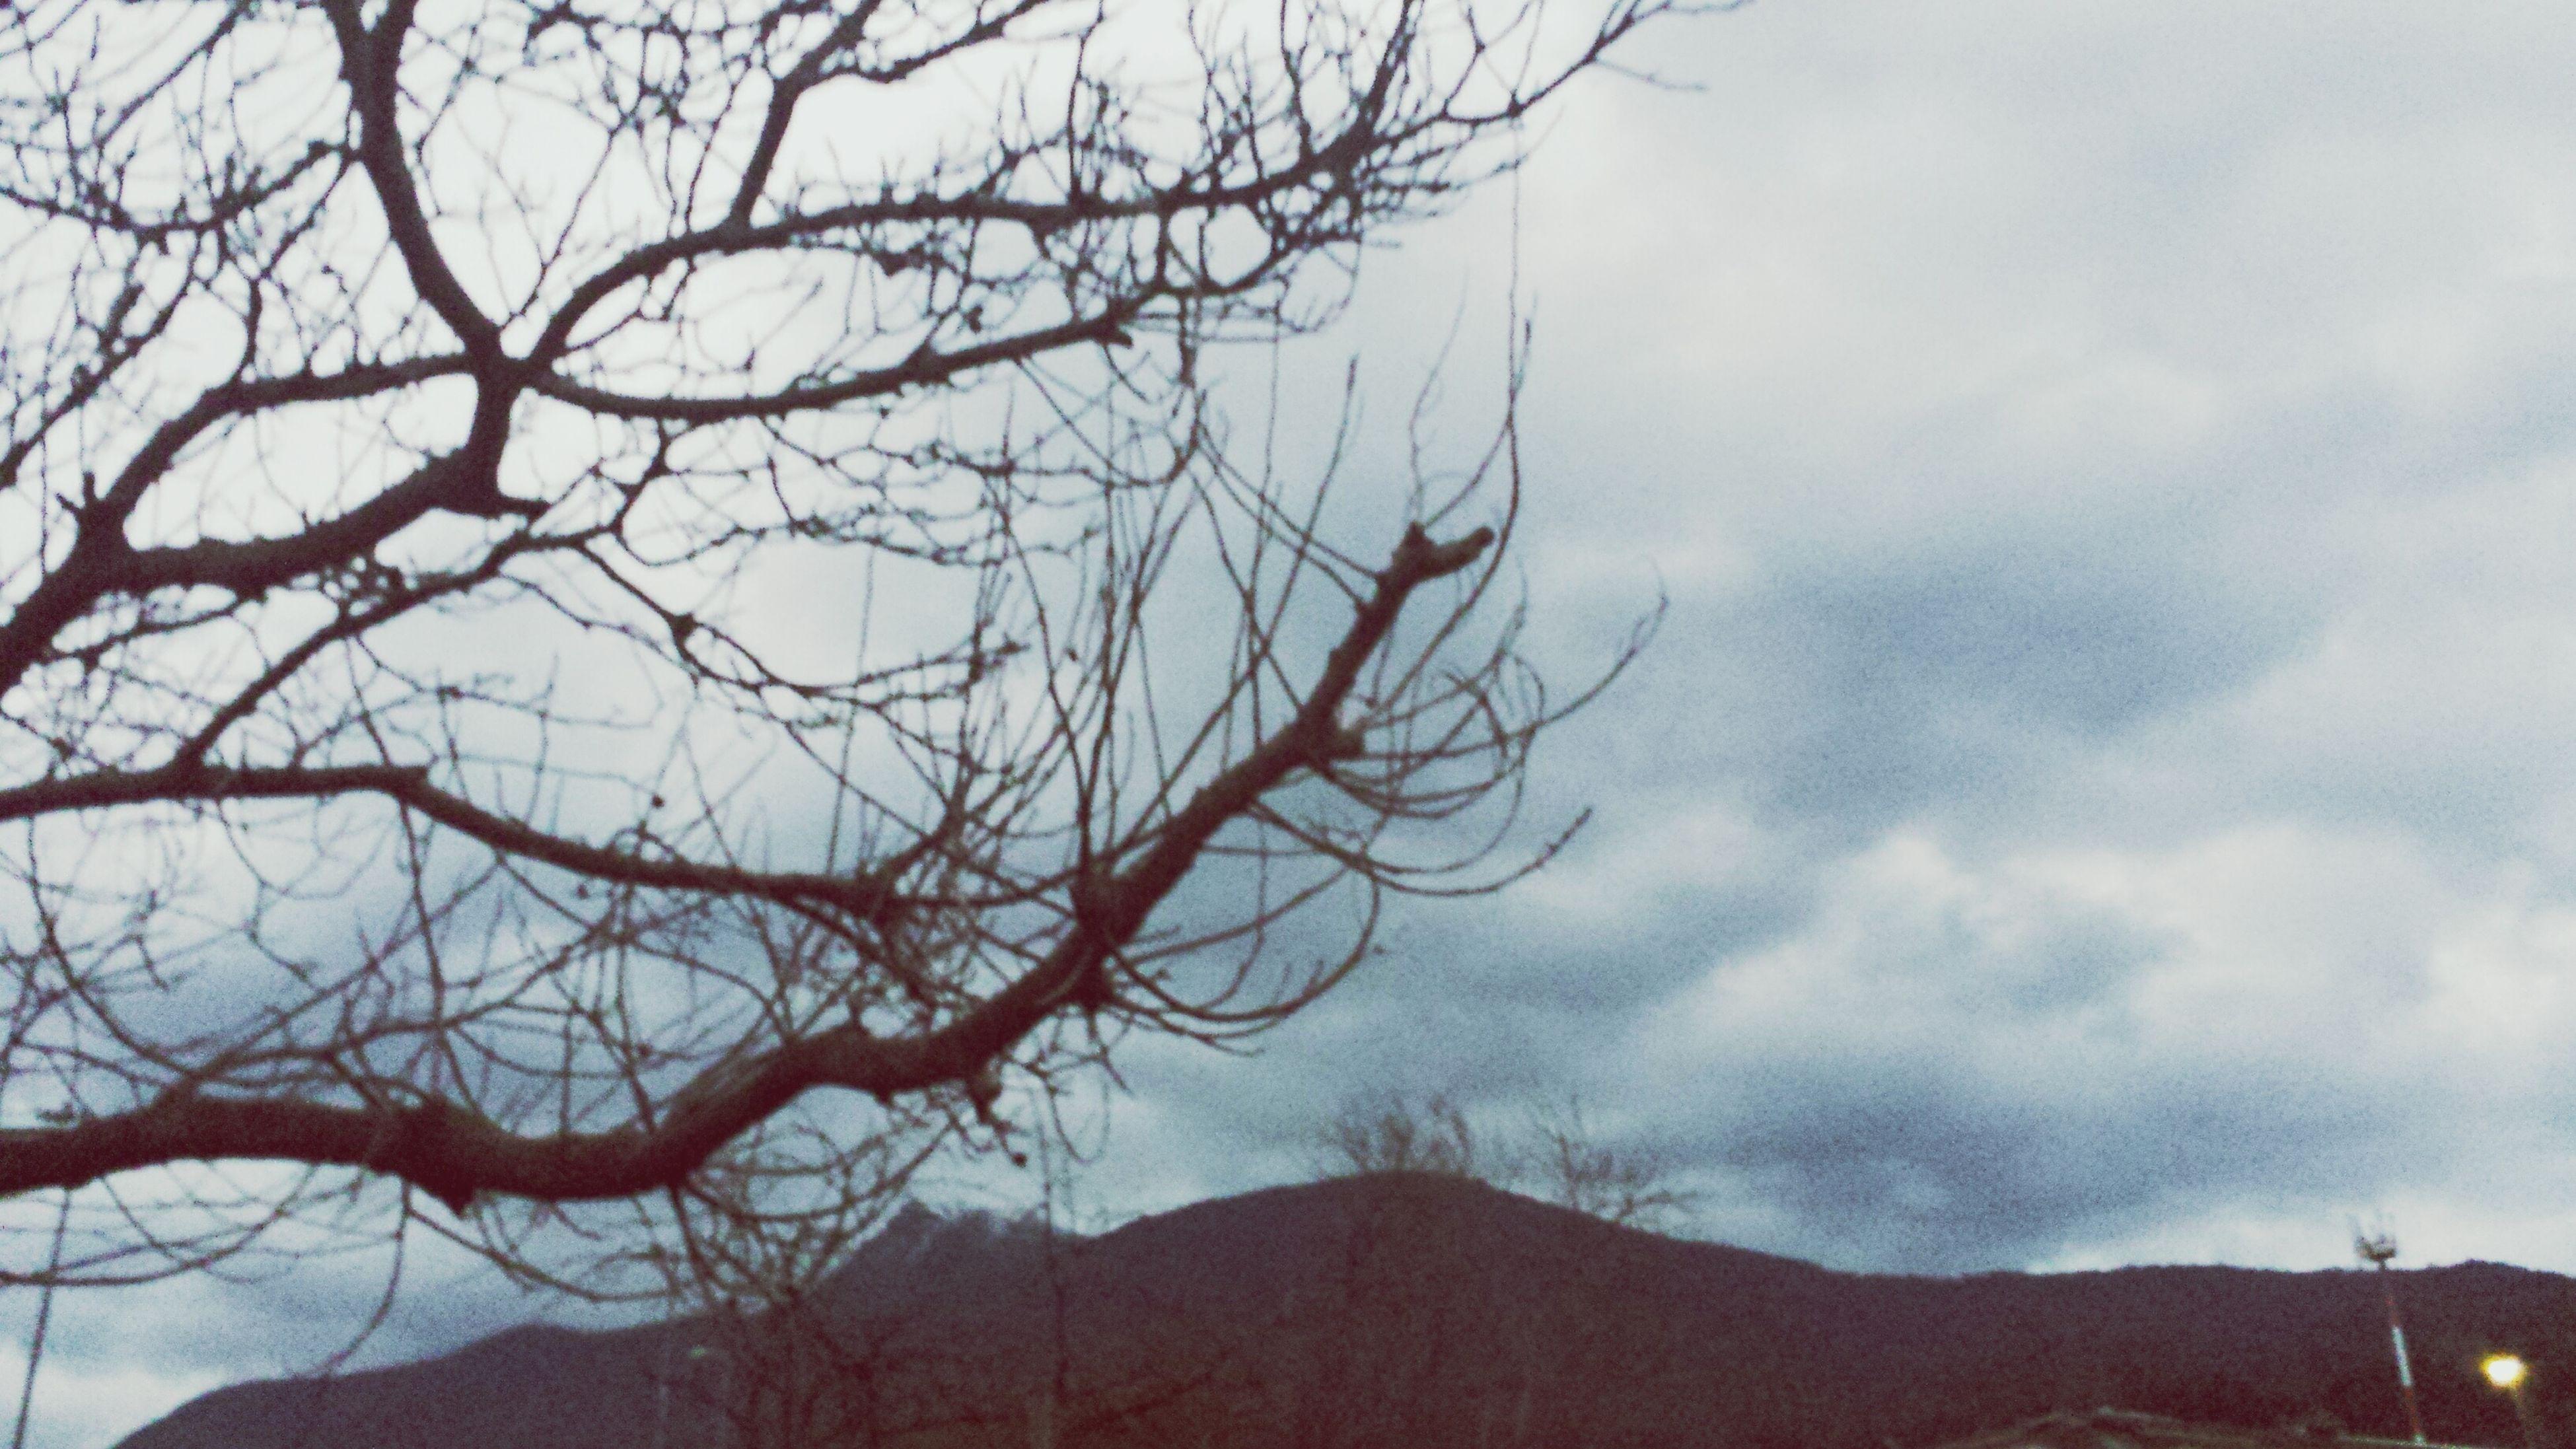 Día y lluvia, invierno 😃 Rain Day Enjoying Life Chile♥ Chile Antuco